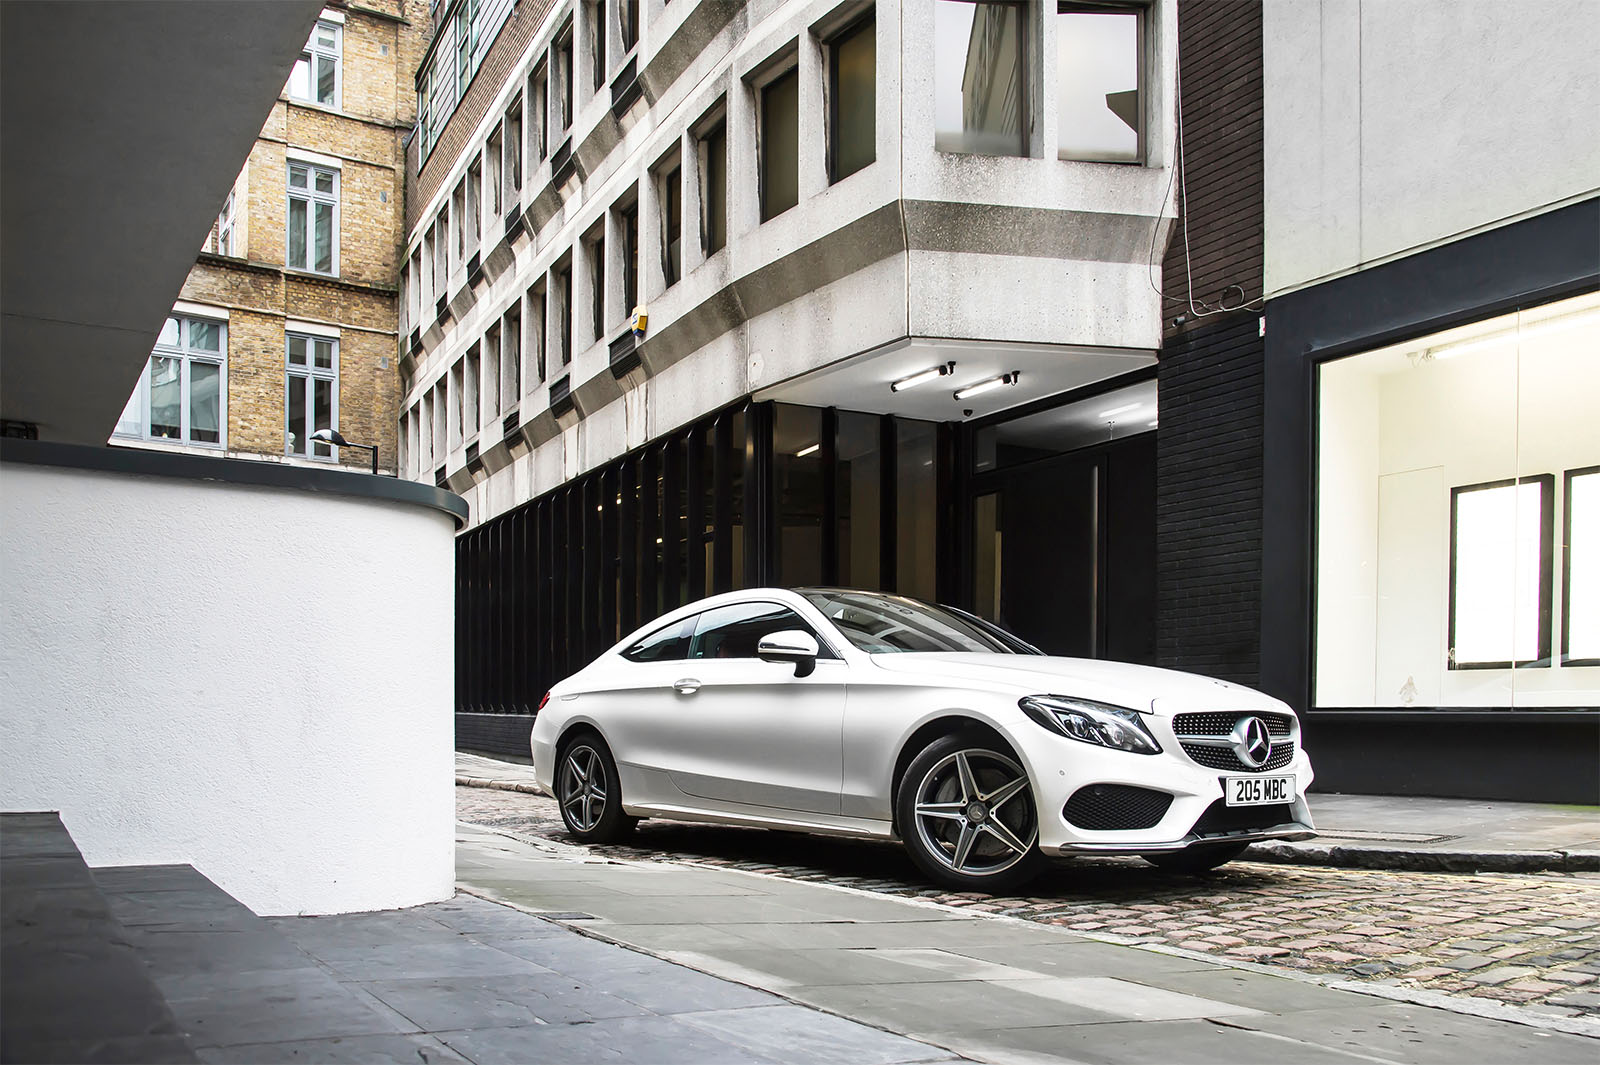 Mercedes C250 AMG featured